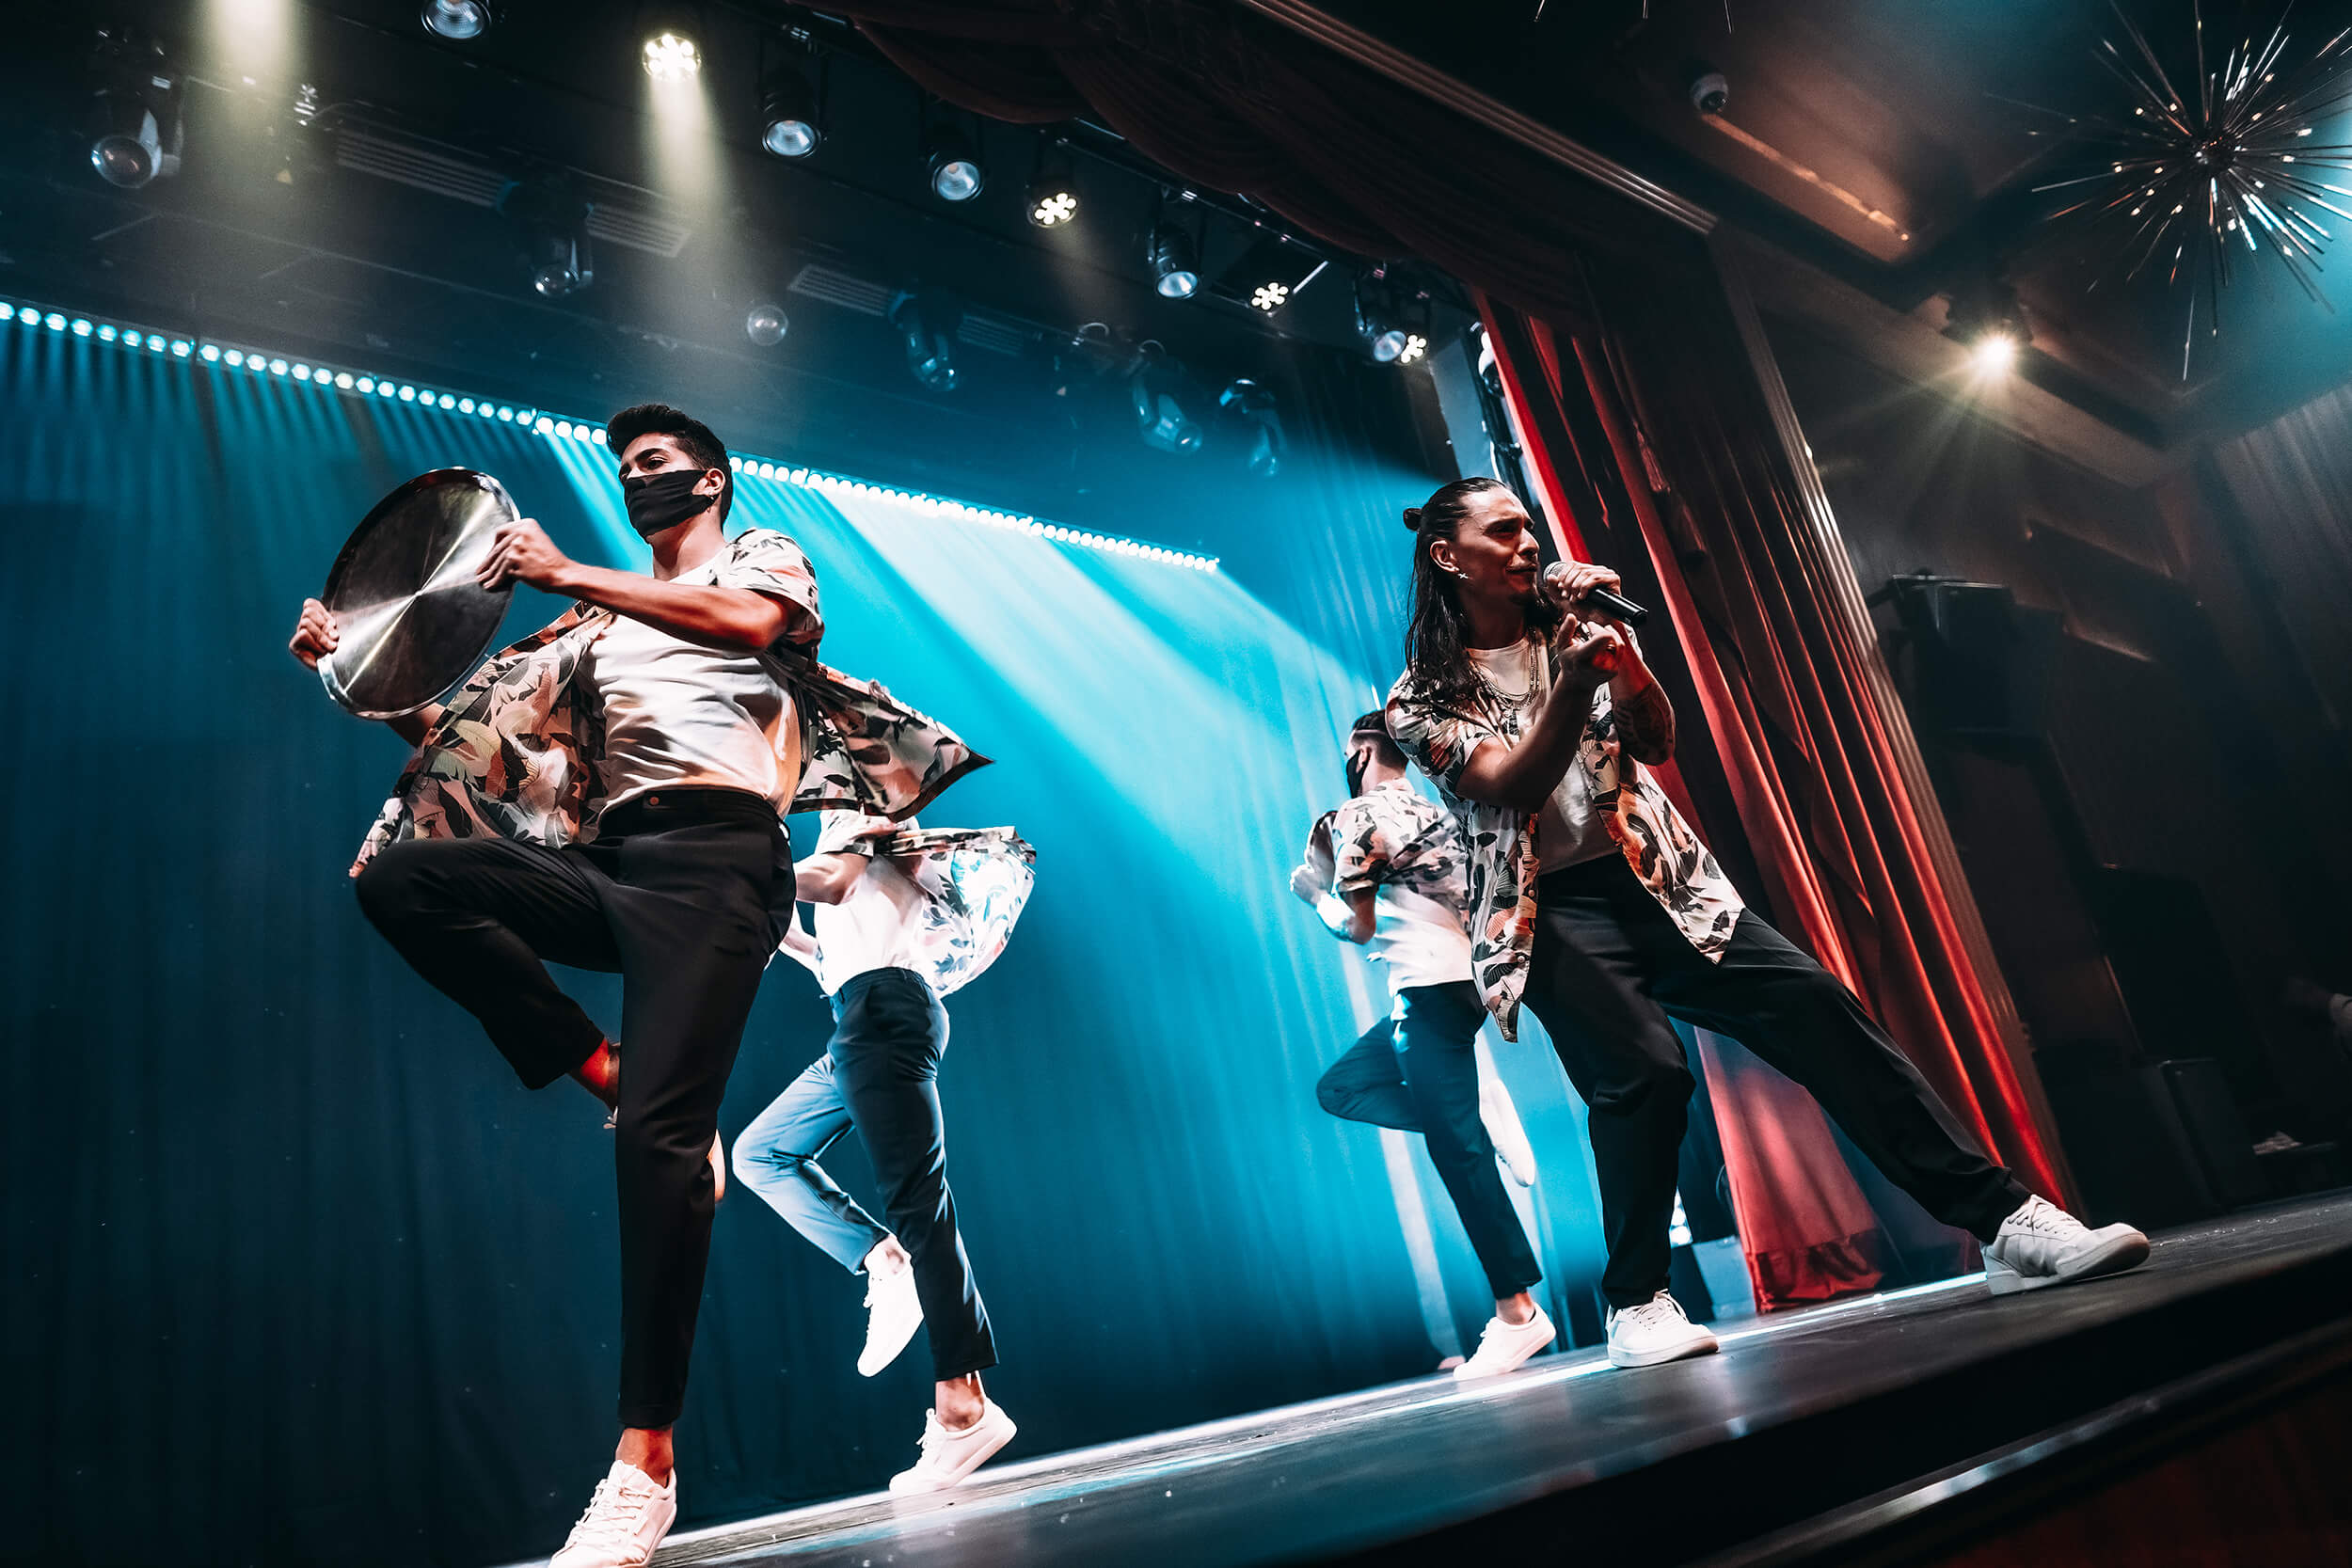 Performers dancing and singing